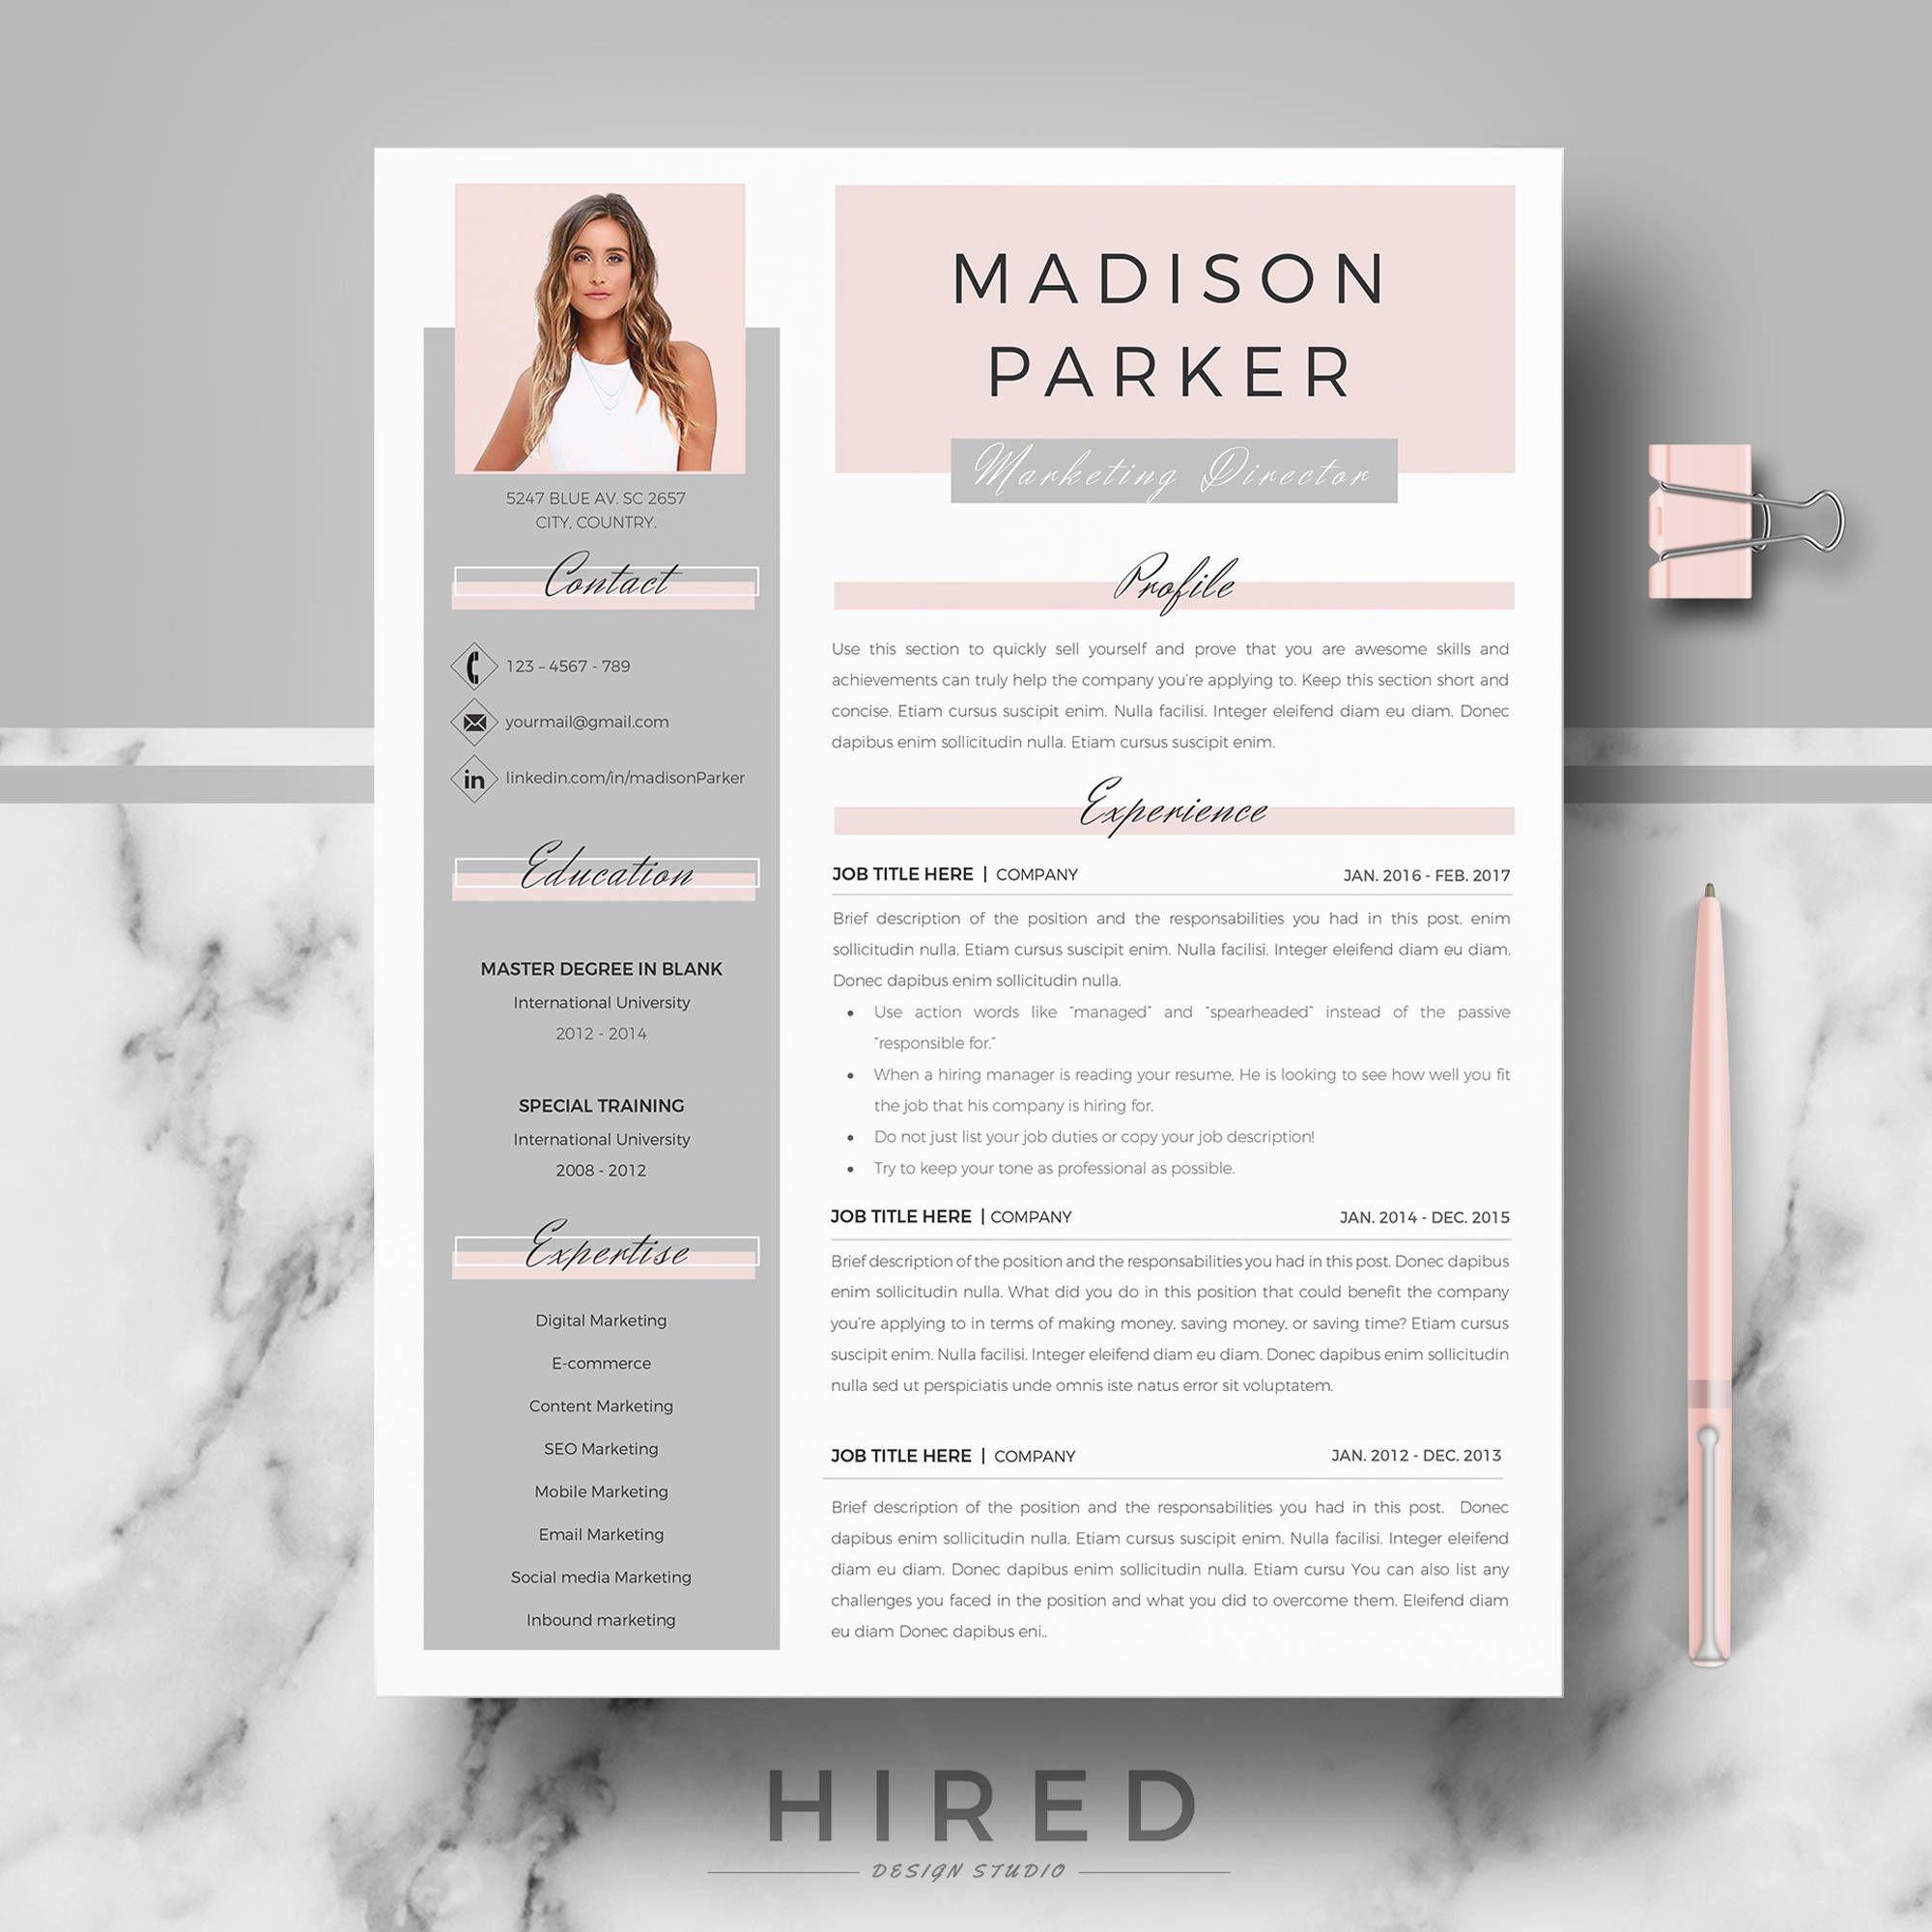 Creative Modern Resume Cv Template For Word And Pages Etsy Resume Design Creative Resume Design Professional Resume Design Template